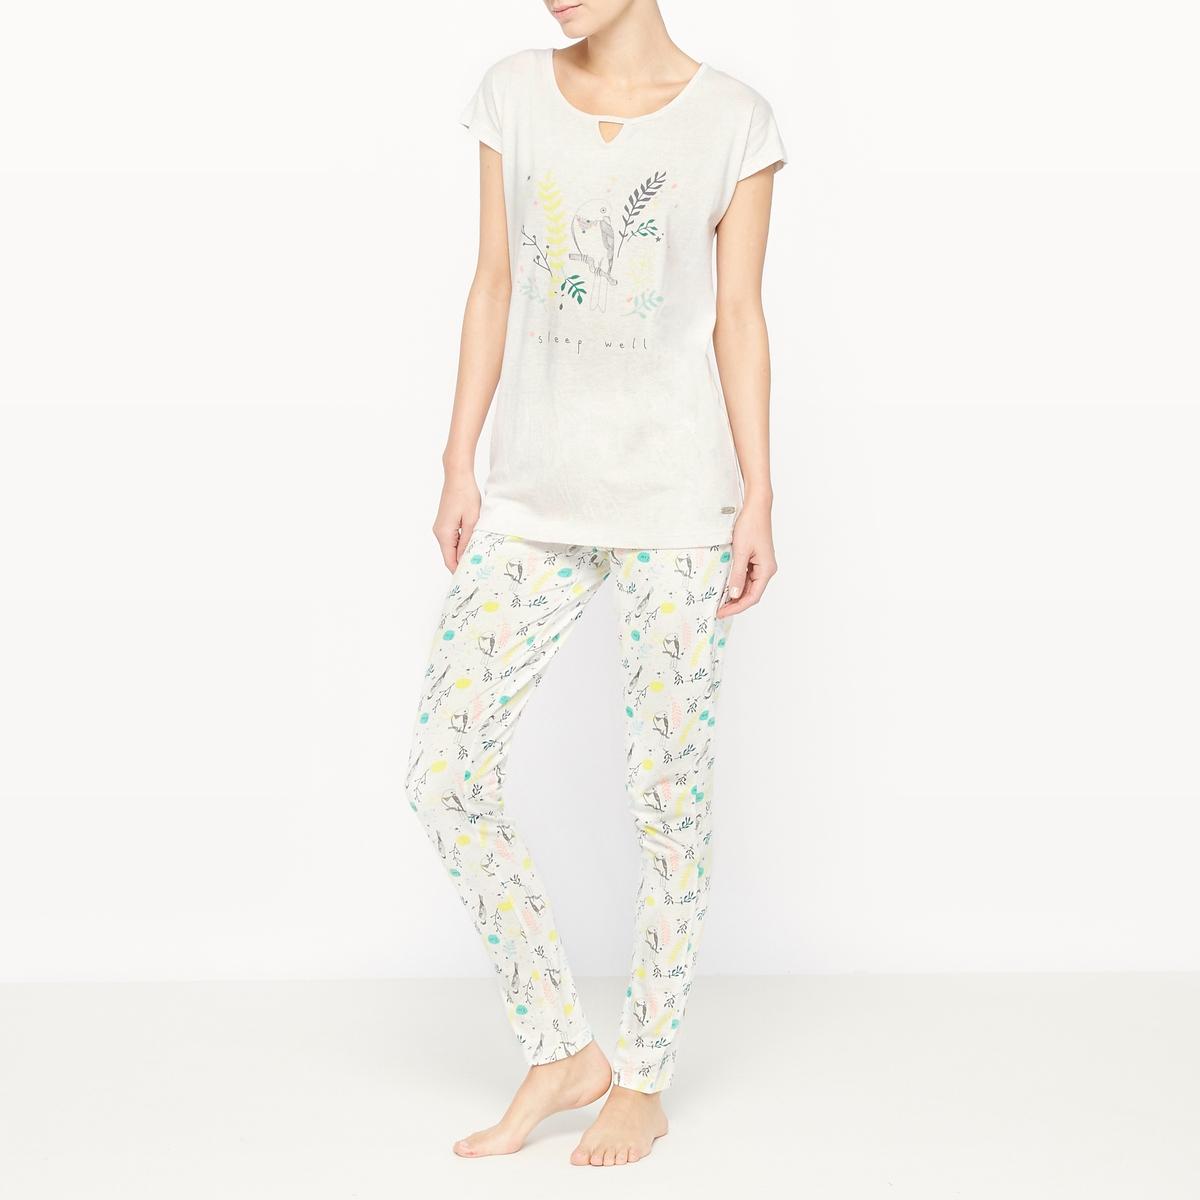 Пижама с короткими рукавами из хлопка Spring